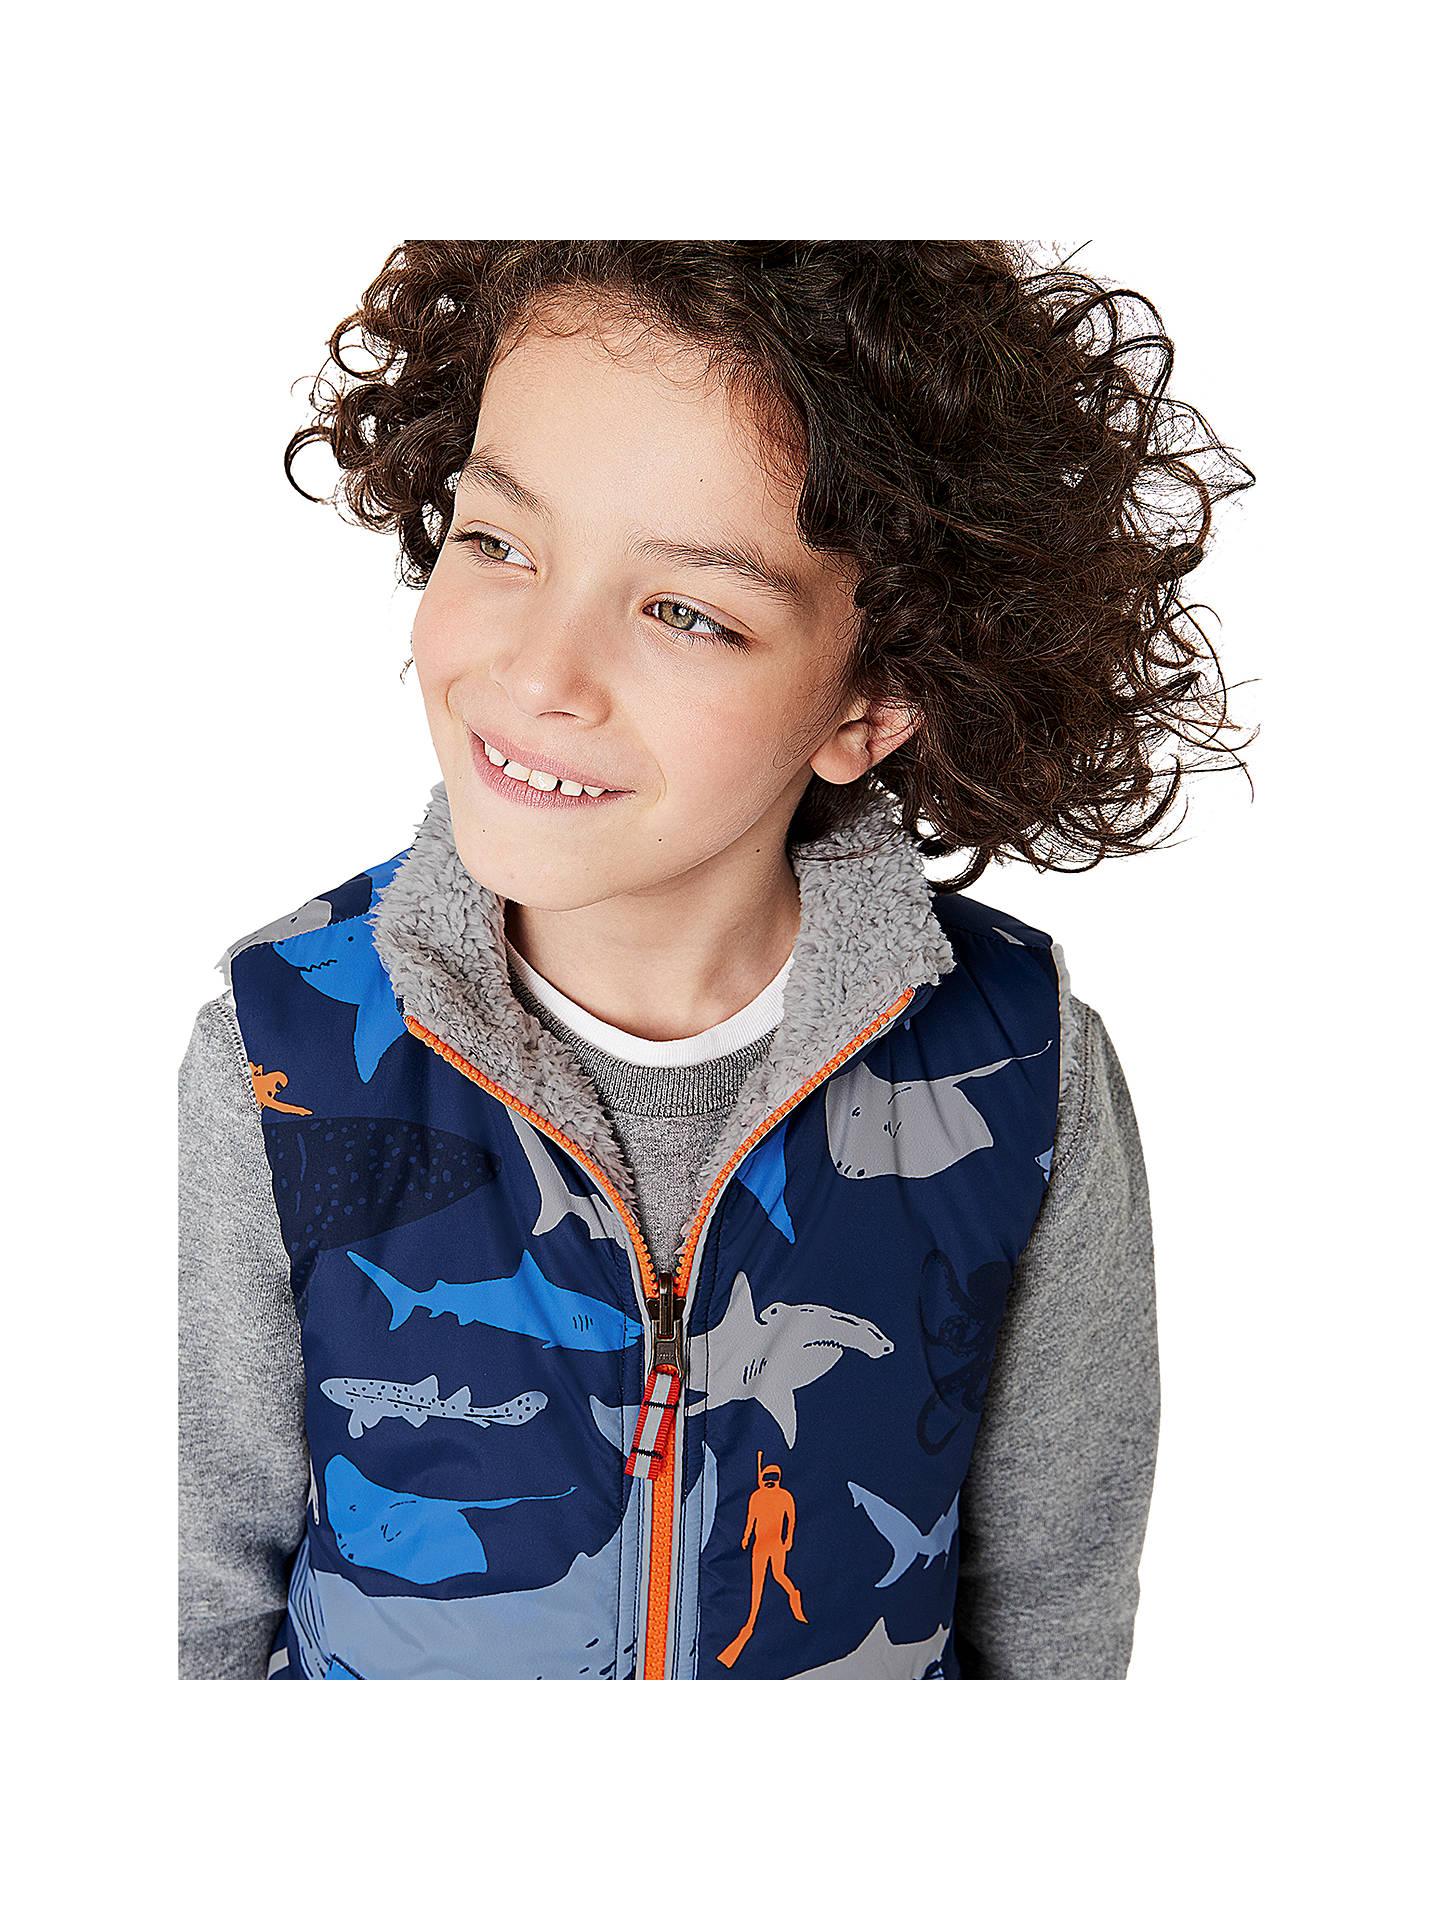 ff86d36a1 ... Buy Mini Boden Boys' Shark Print Reversible Gilet, Blue, 2-3 years ...